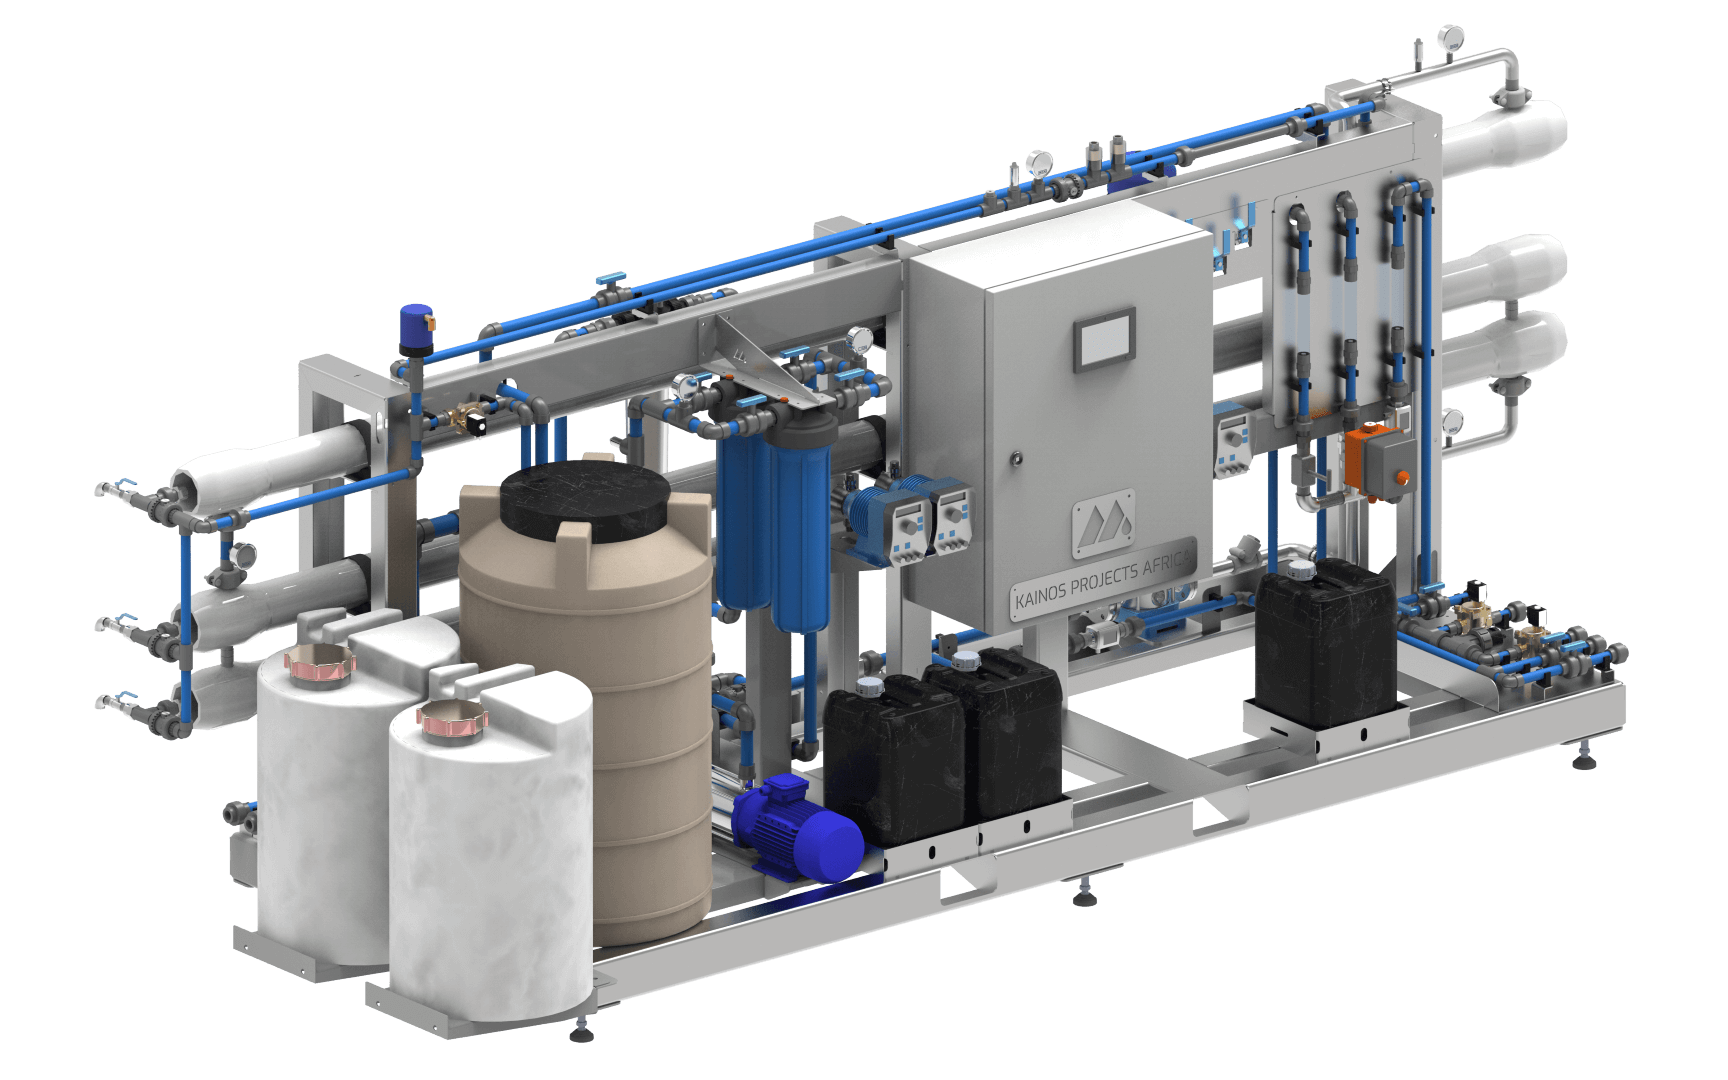 Kainos Desalination Plant